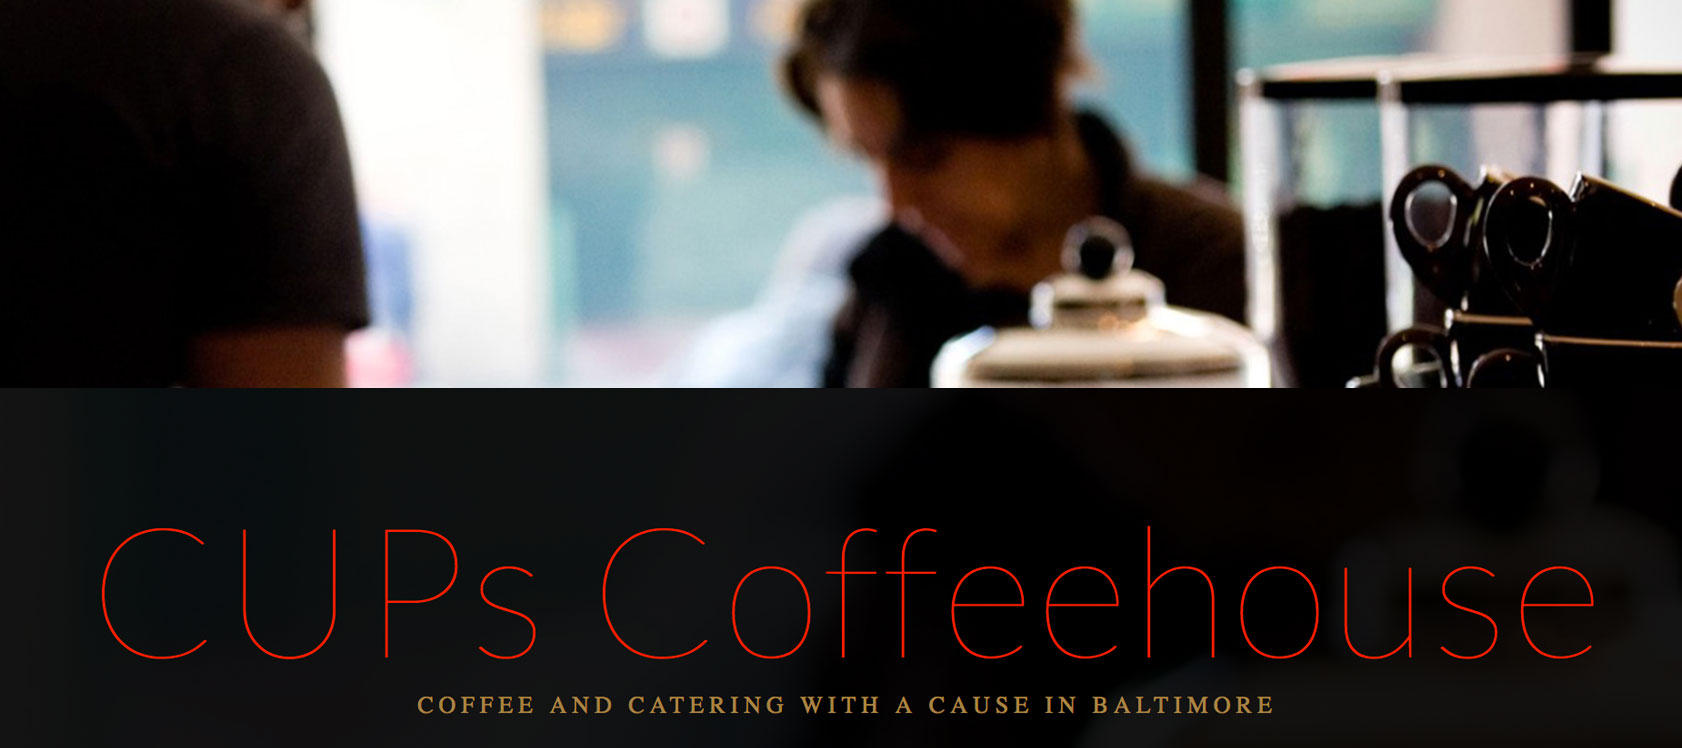 Cups Coffeehouse